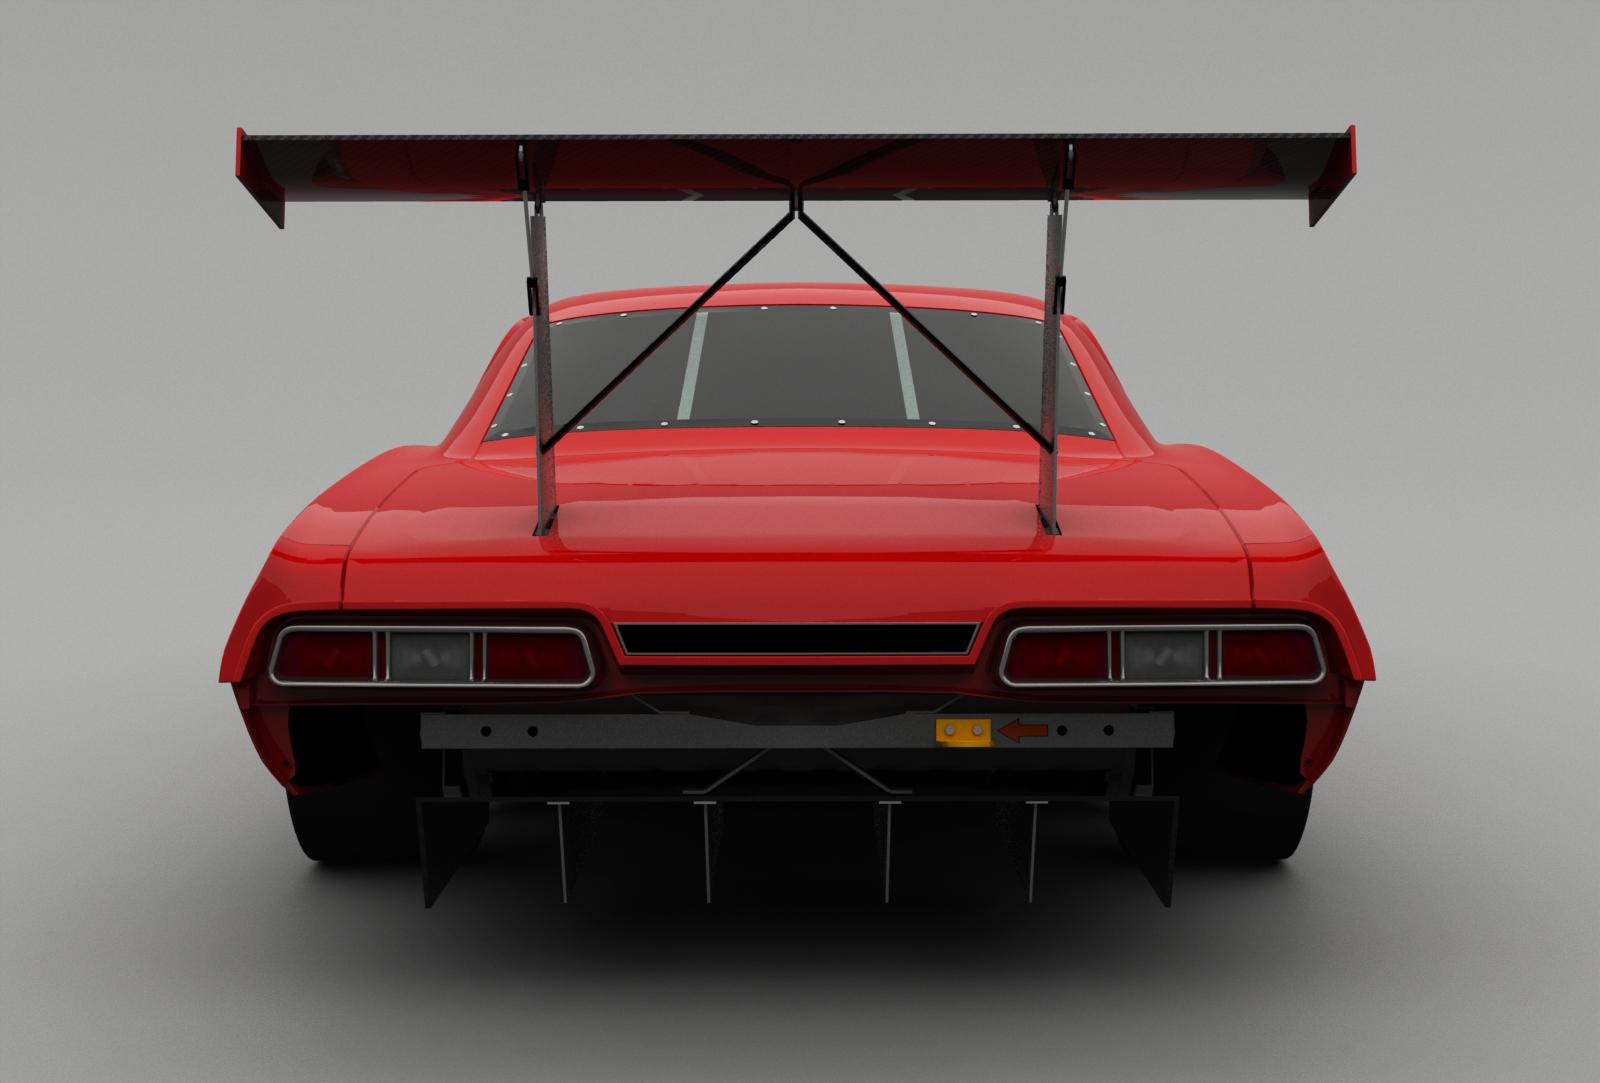 2013-03_The Crew_F.Beudin_Chevrolet Impala-1967-Racing_08